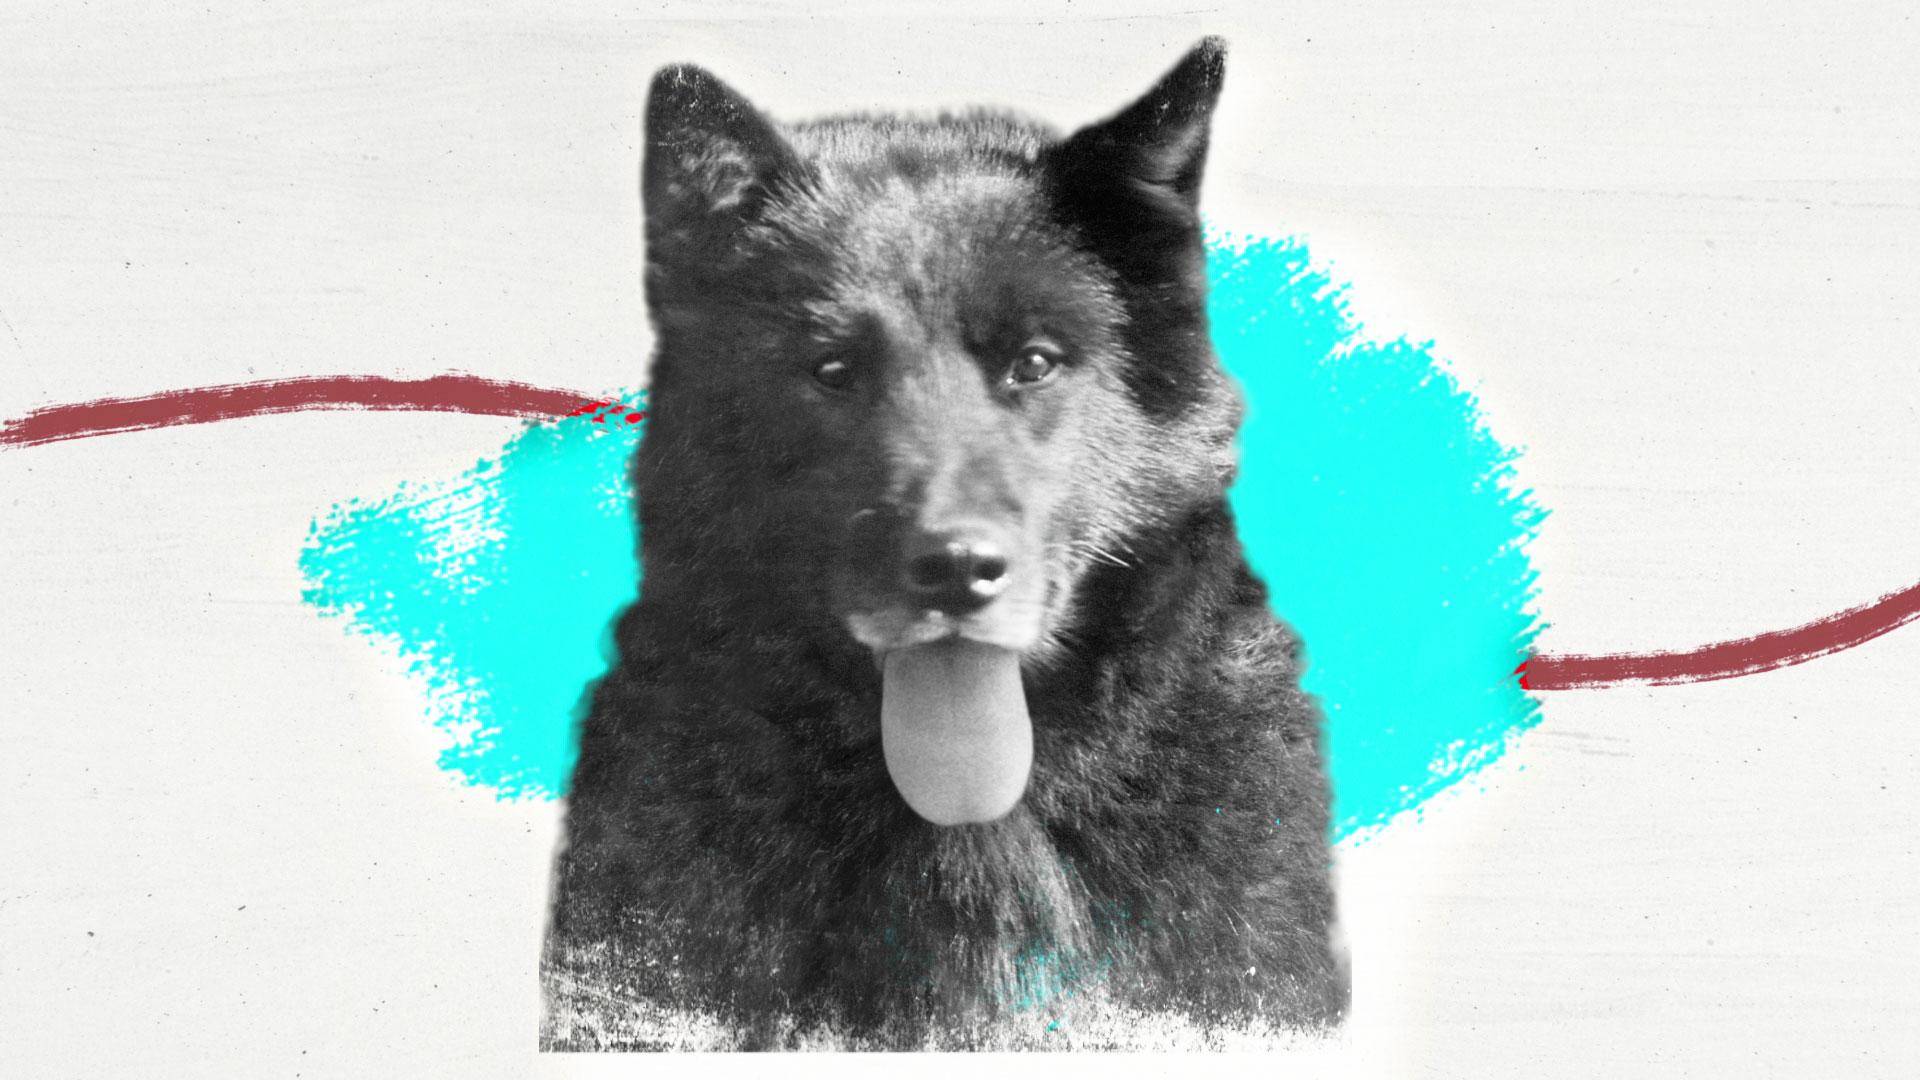 Biography: Balto the Sled Dog